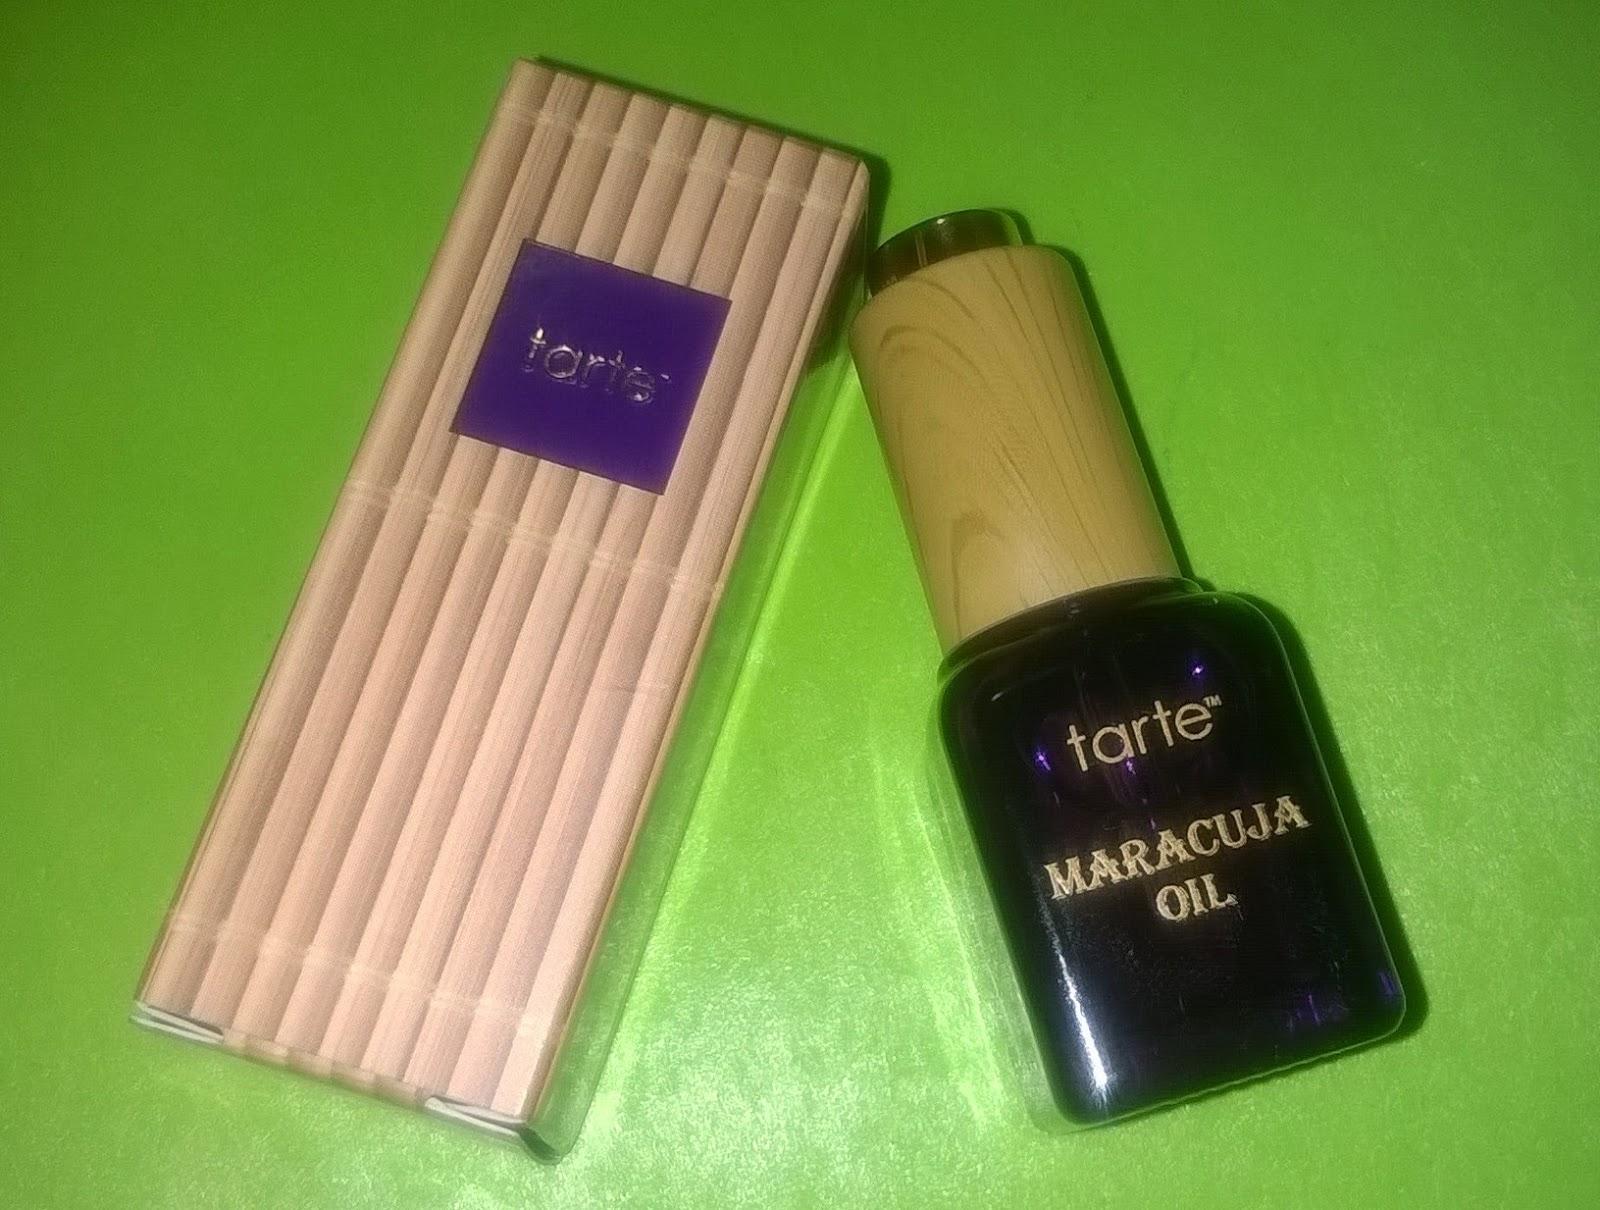 Tarte Deluxe Maracuja Oil